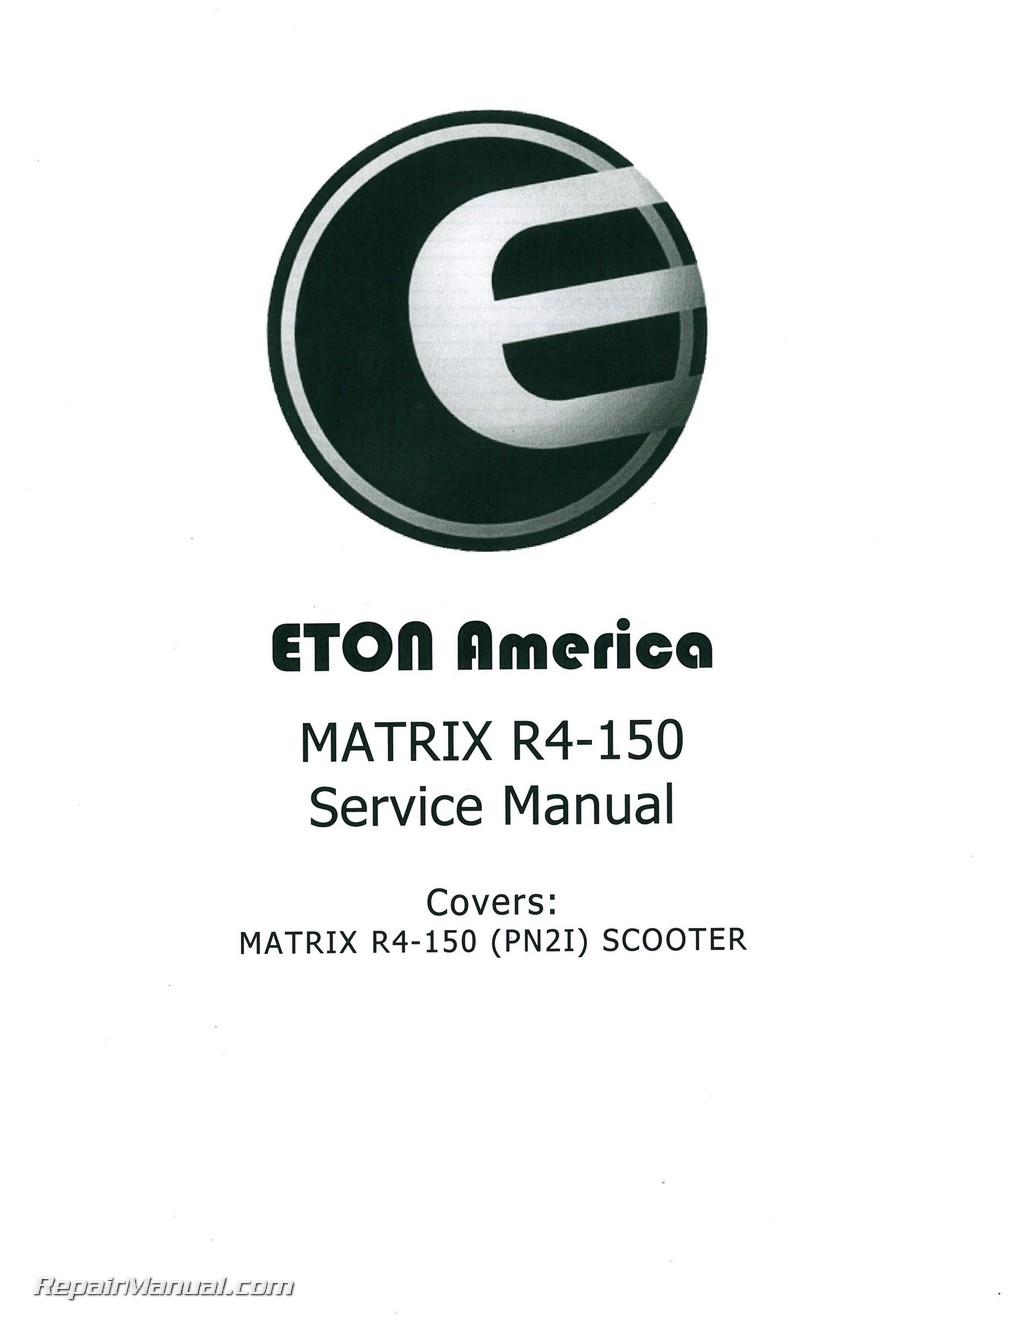 ... Array - eton matrix r4 150 service manual rh repairmanual ...